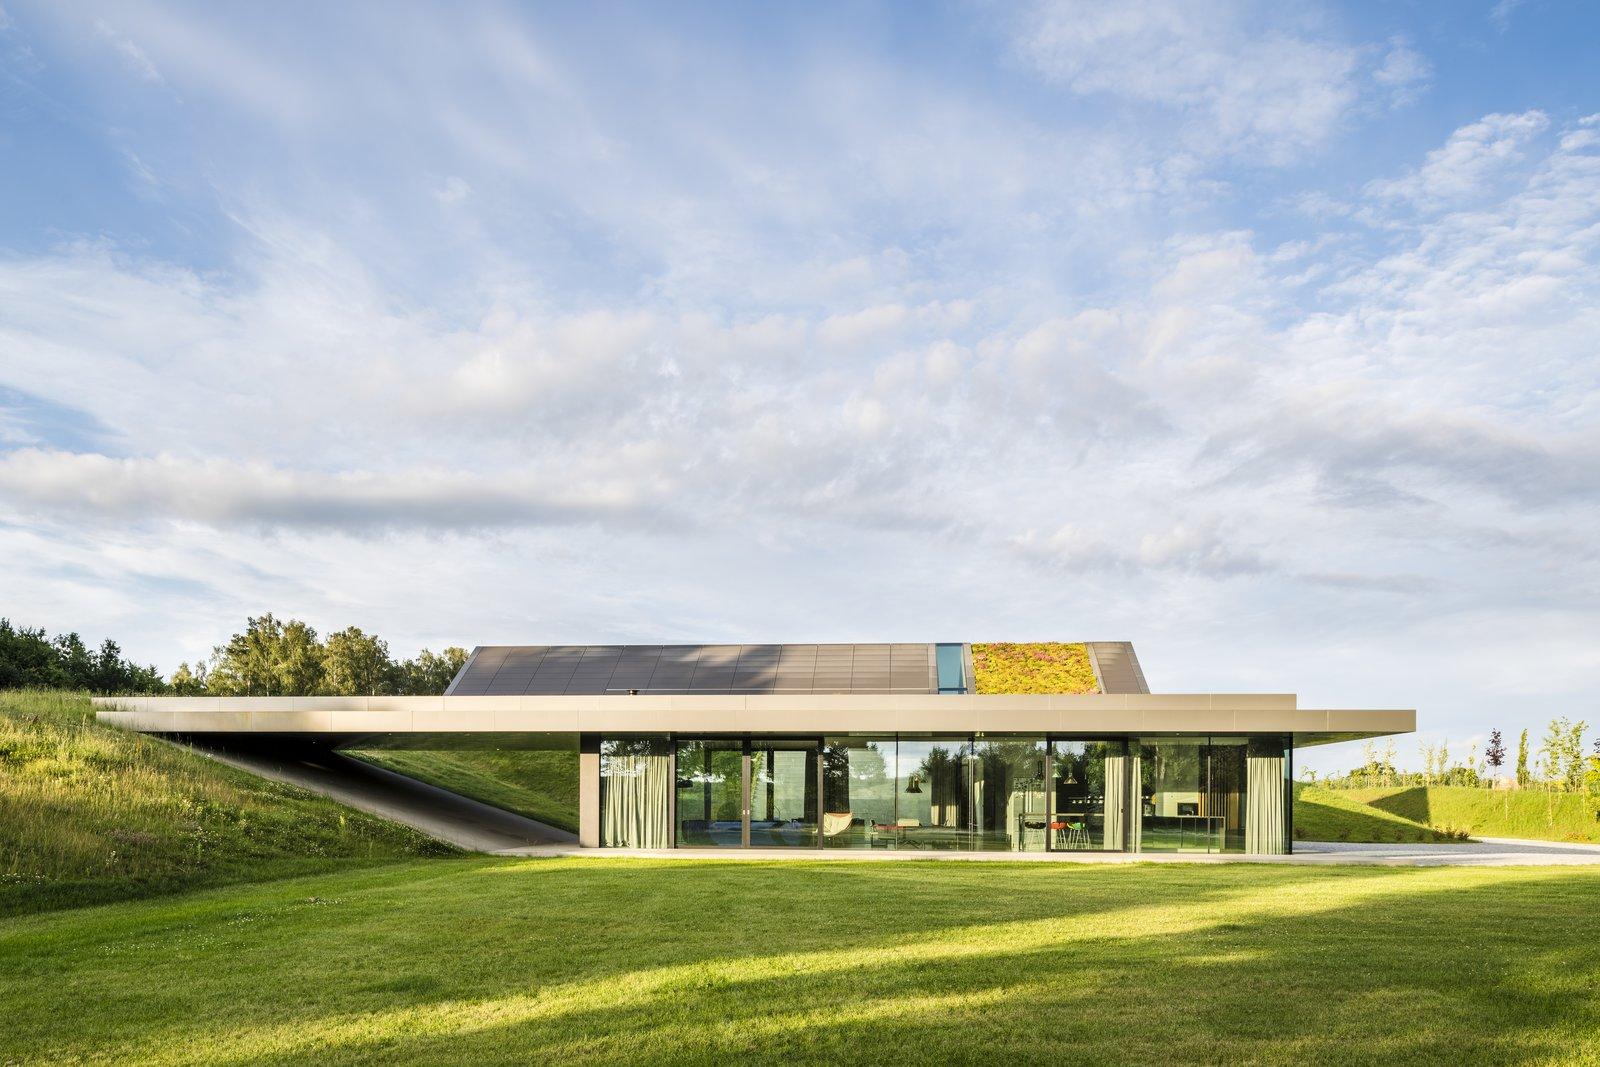 Green Line by Mobius Architekci